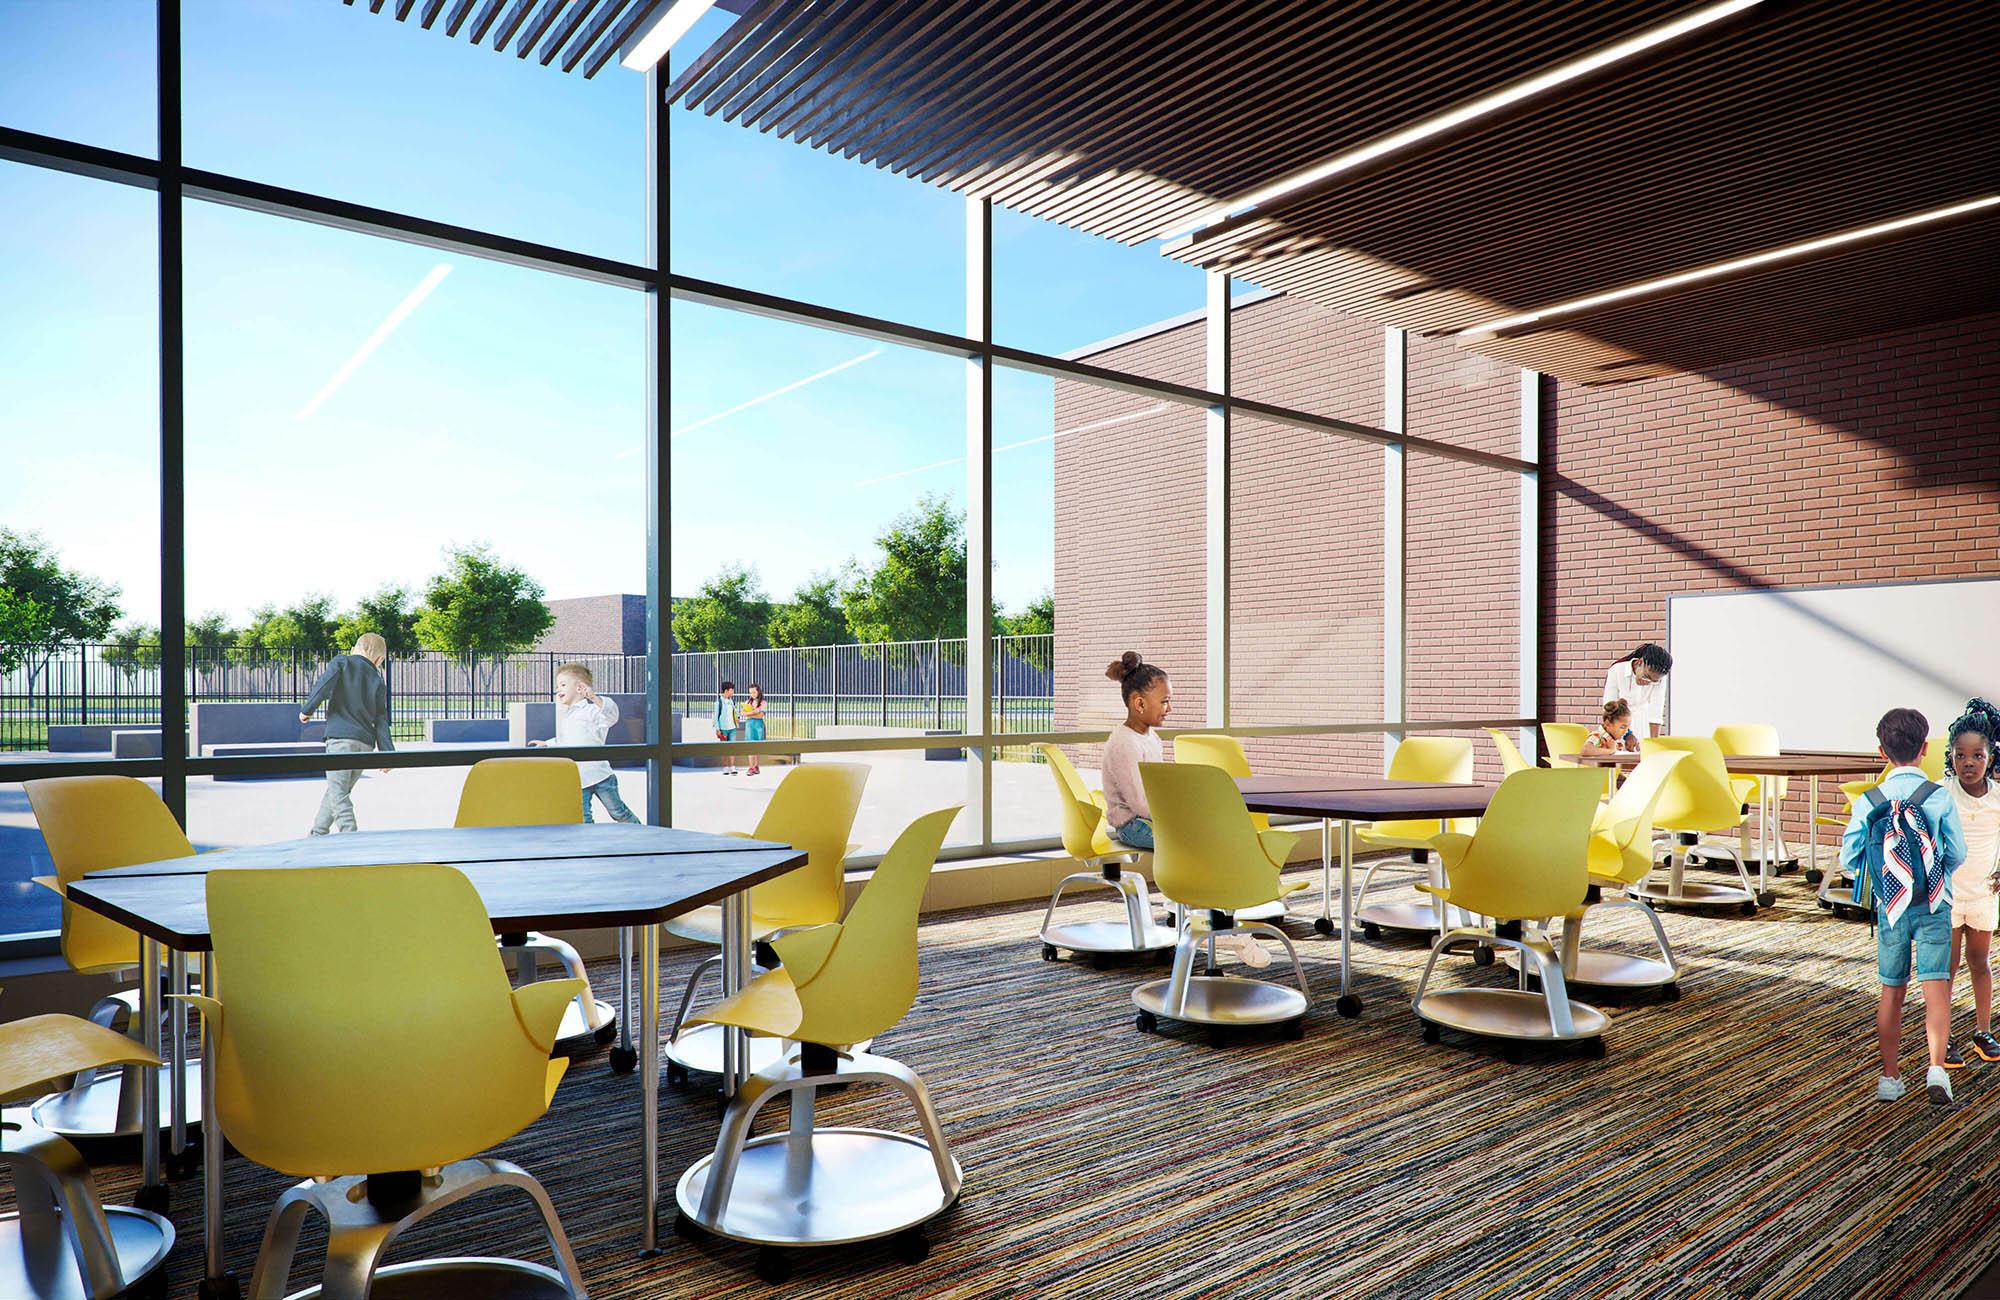 JCPS-WestBroadwayElementarySchool-collaborativespace